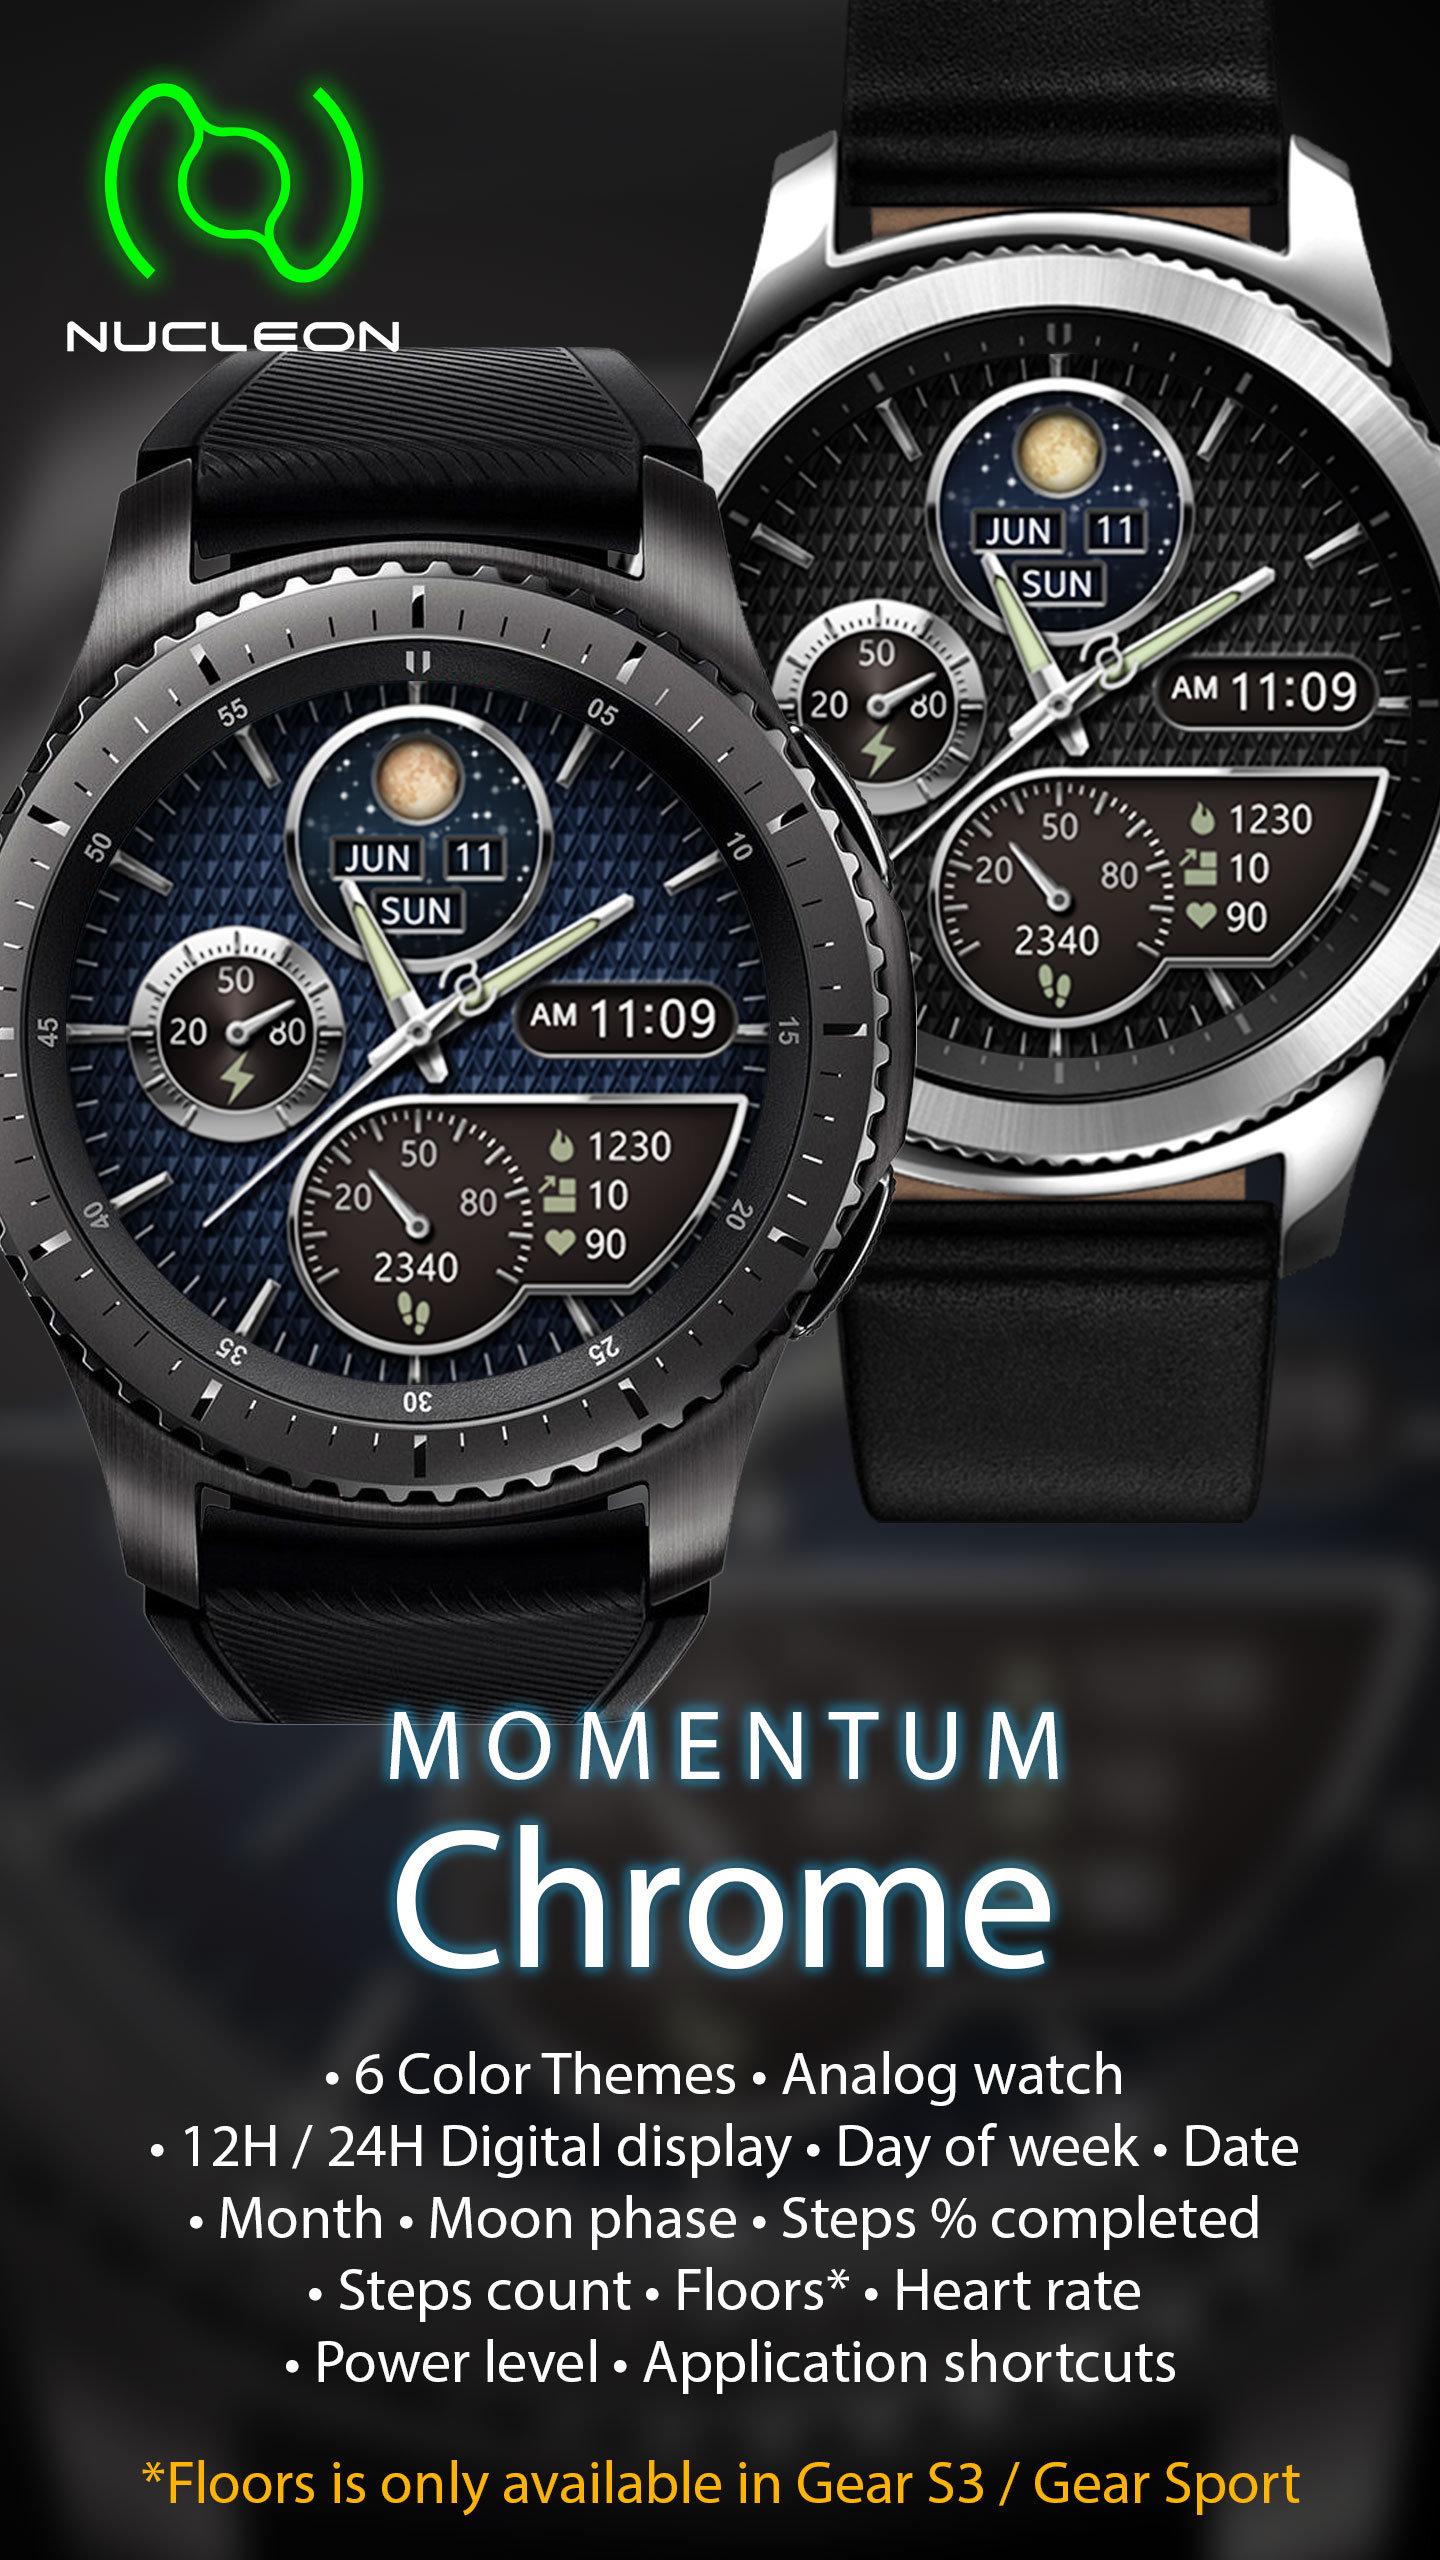 Momentum Chrome